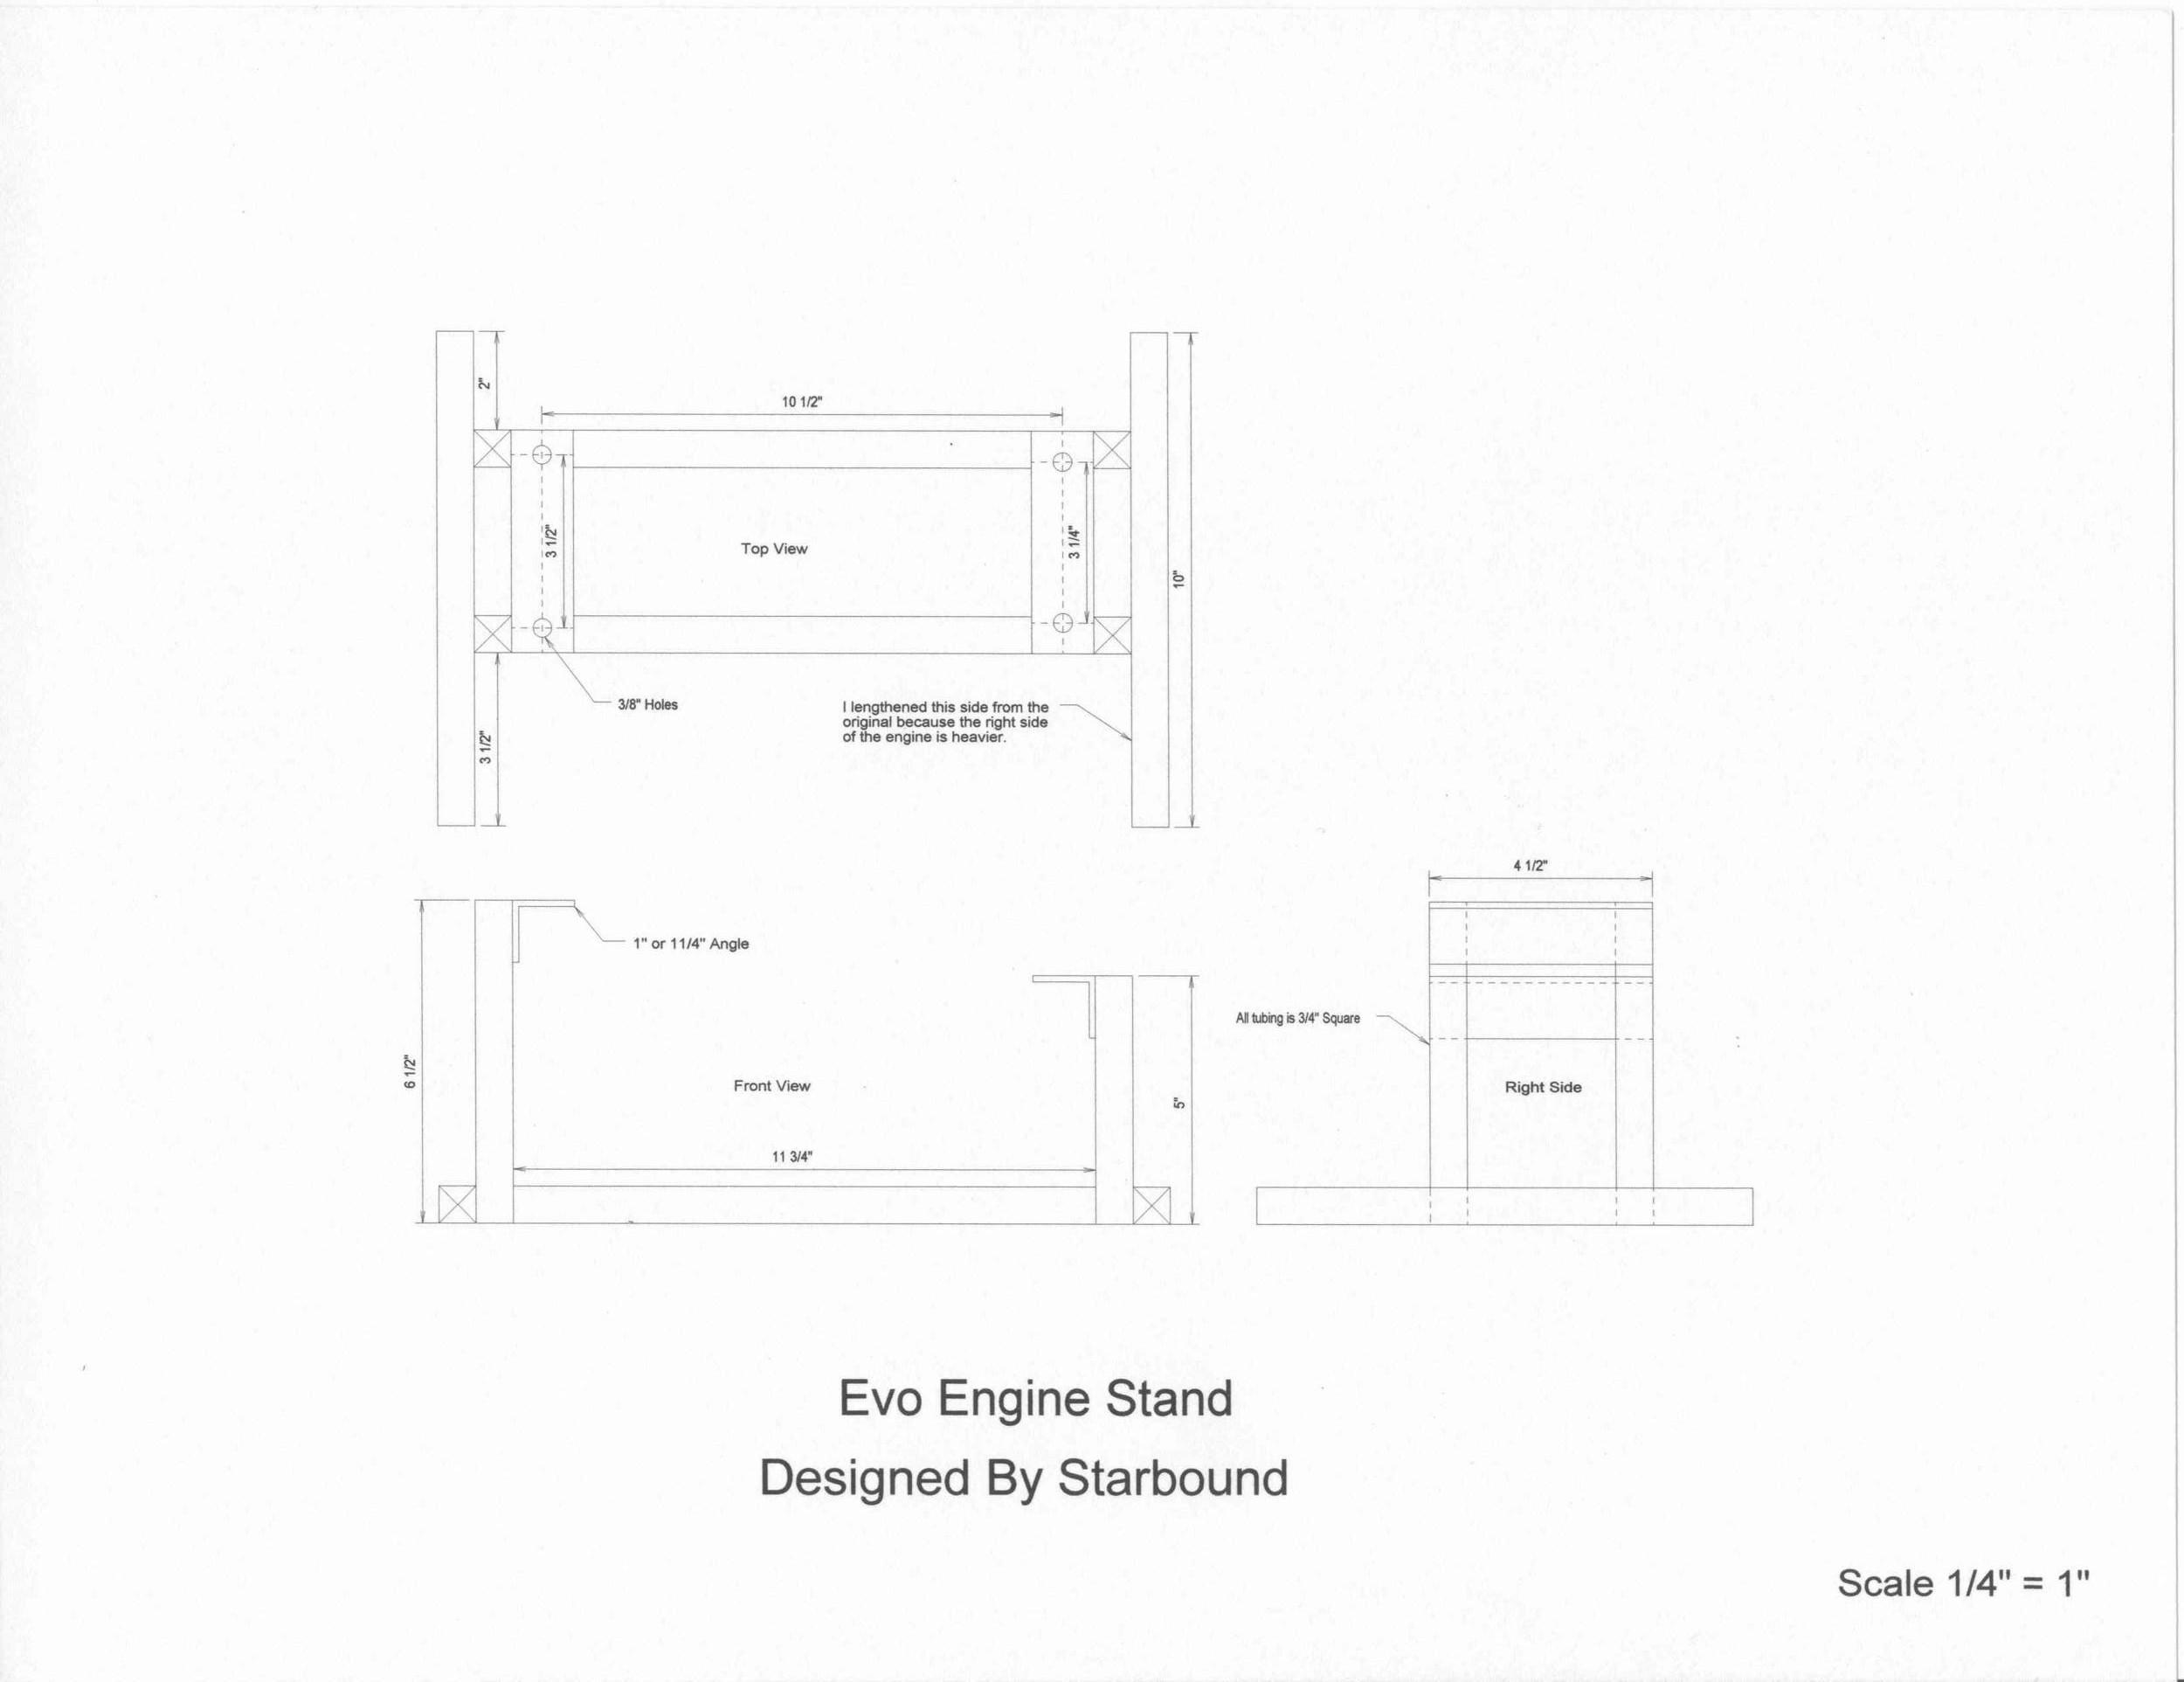 80 harley evolution engine diagram wiring diagramplans for a harley motor stand u2013 mustaribrandharley [ 2500 x 1925 Pixel ]